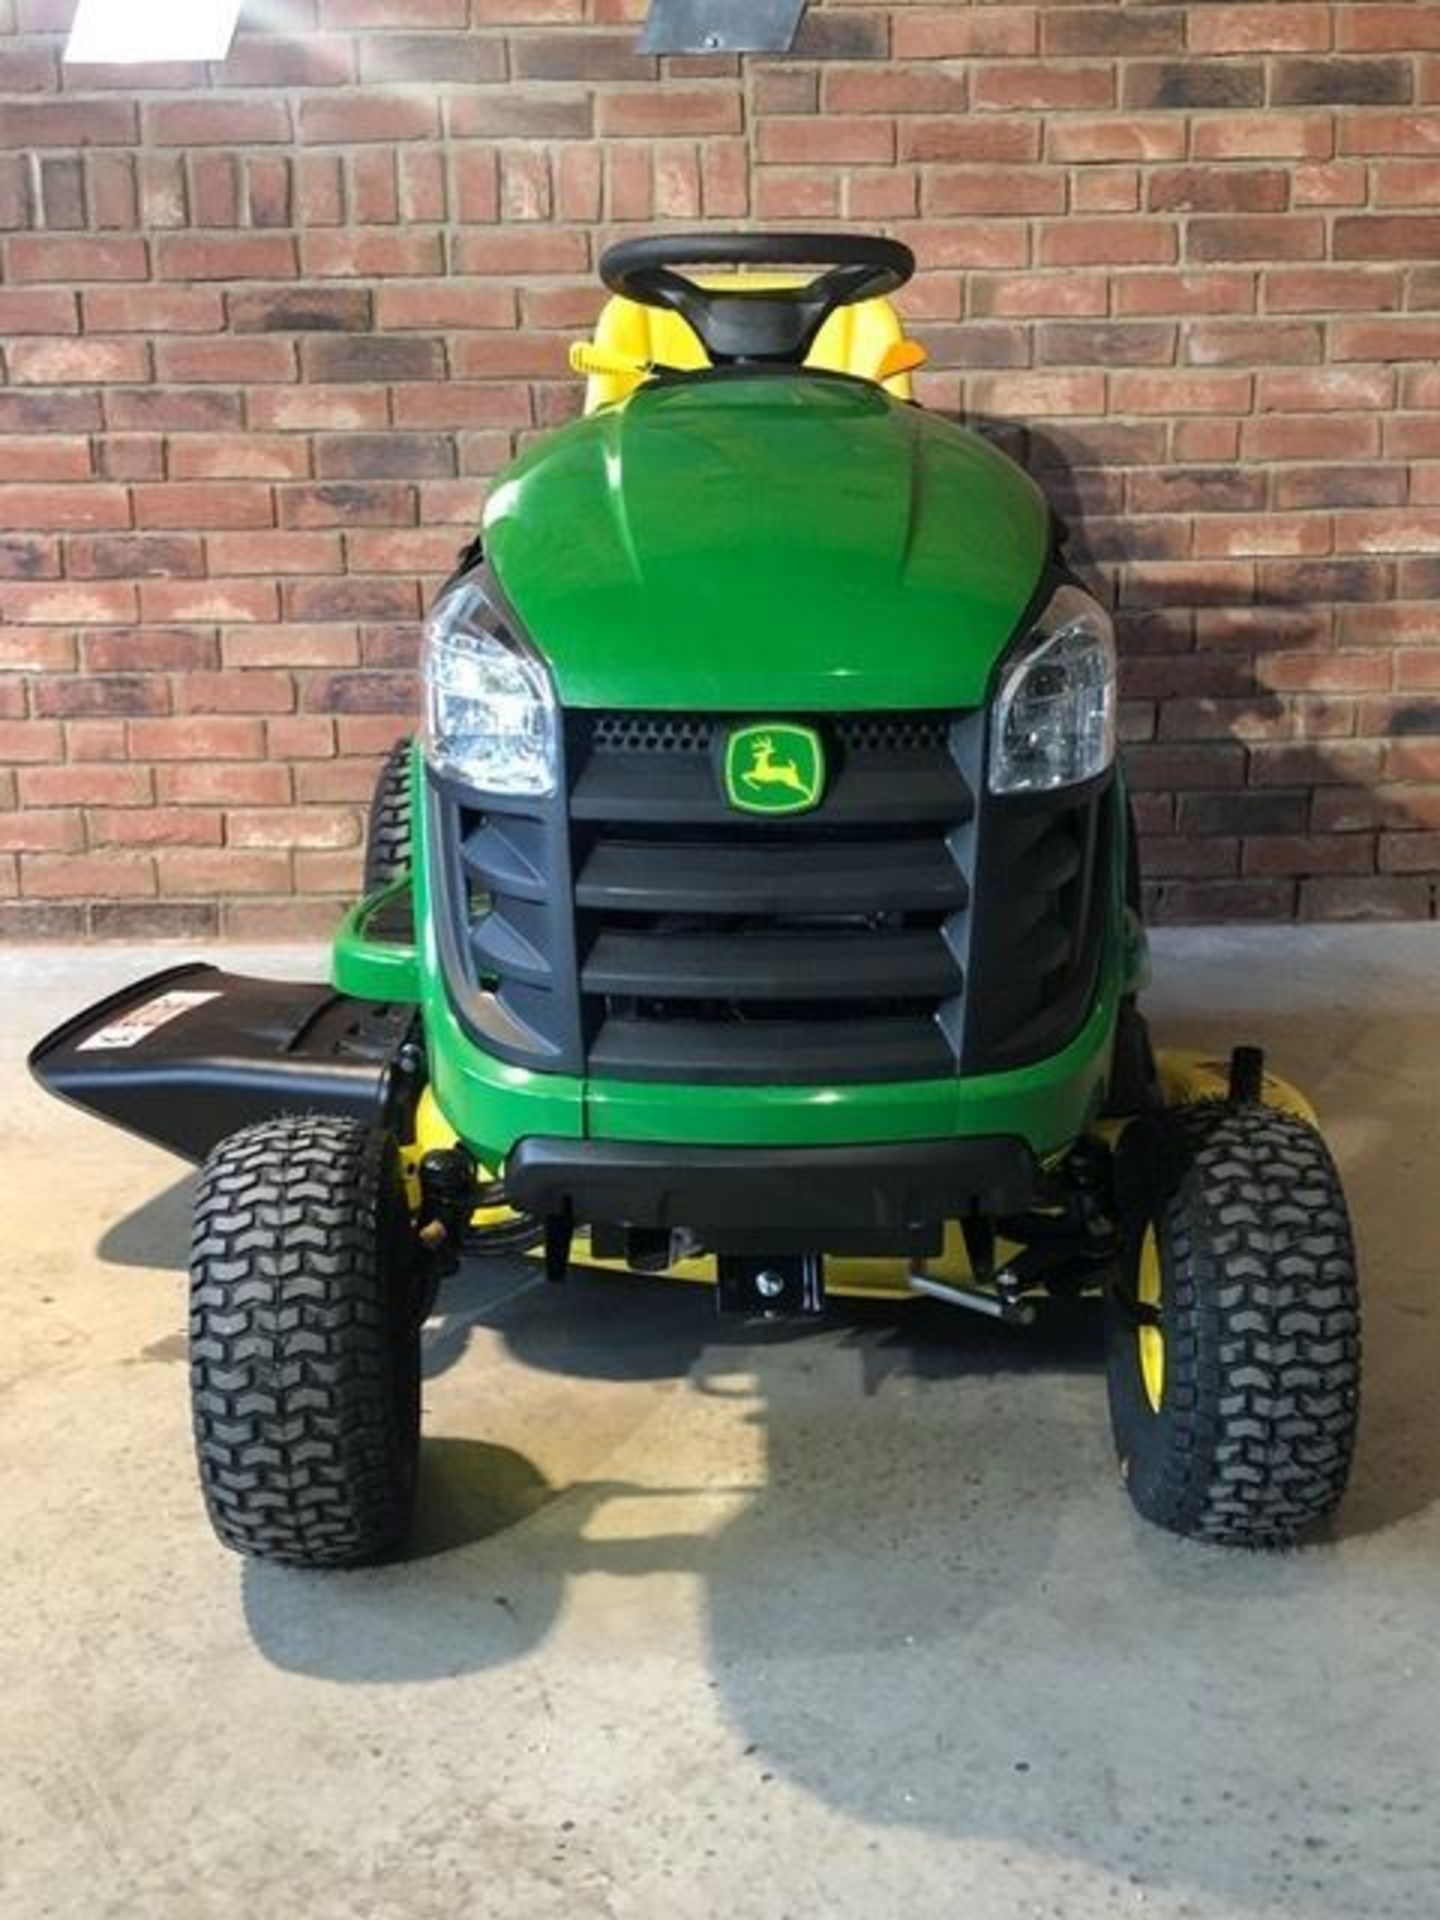 Lot 2 - John Deere 42in Ride On Tractor Mower